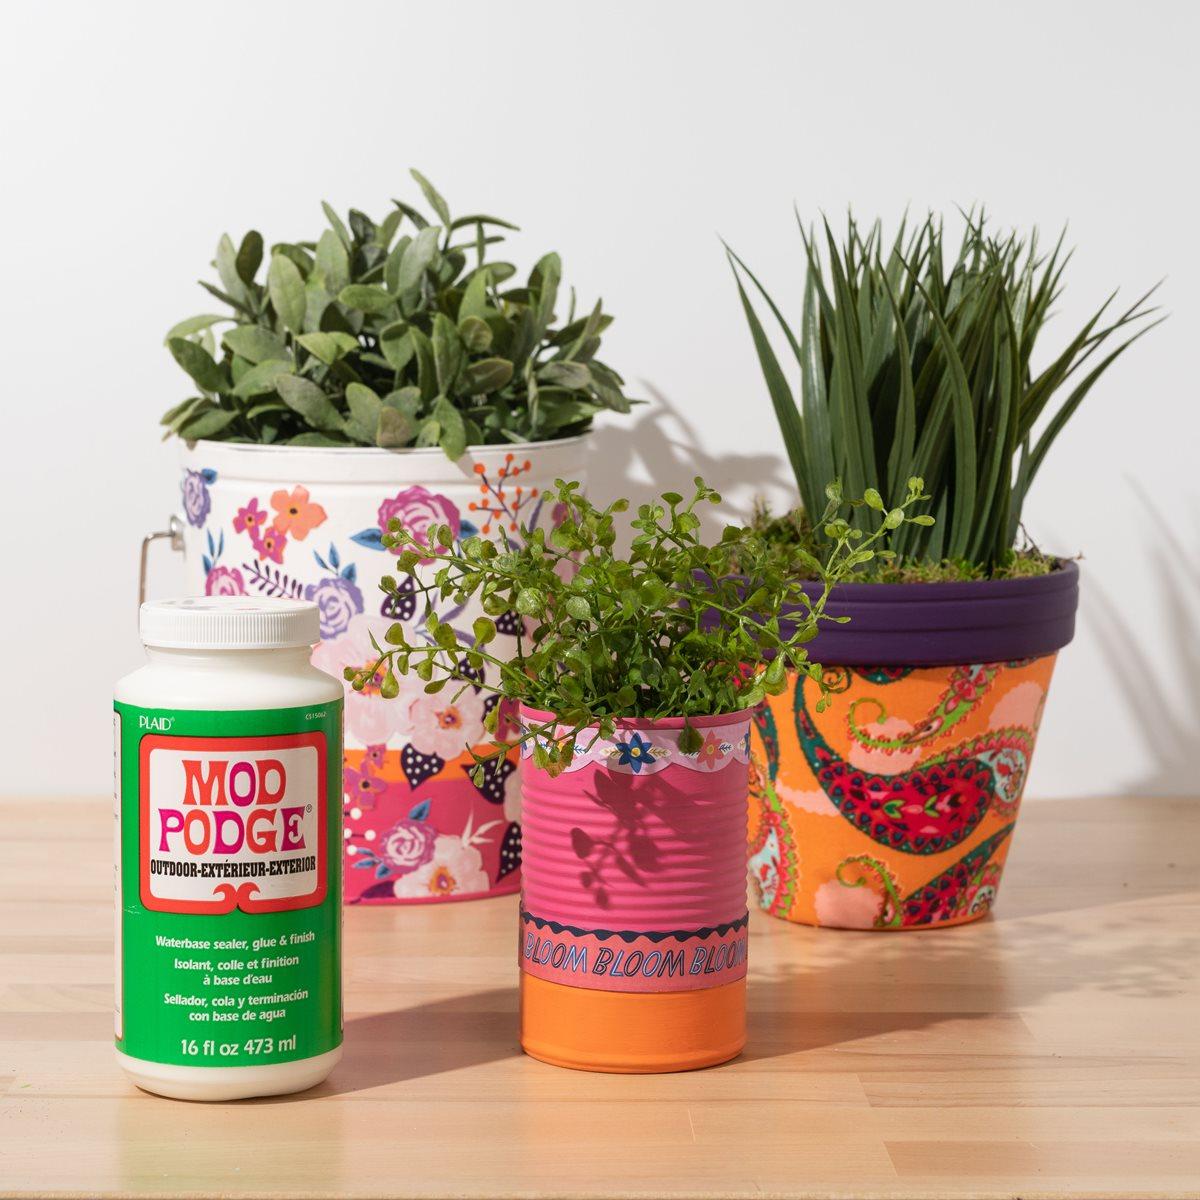 Mod Podge Garden Pots